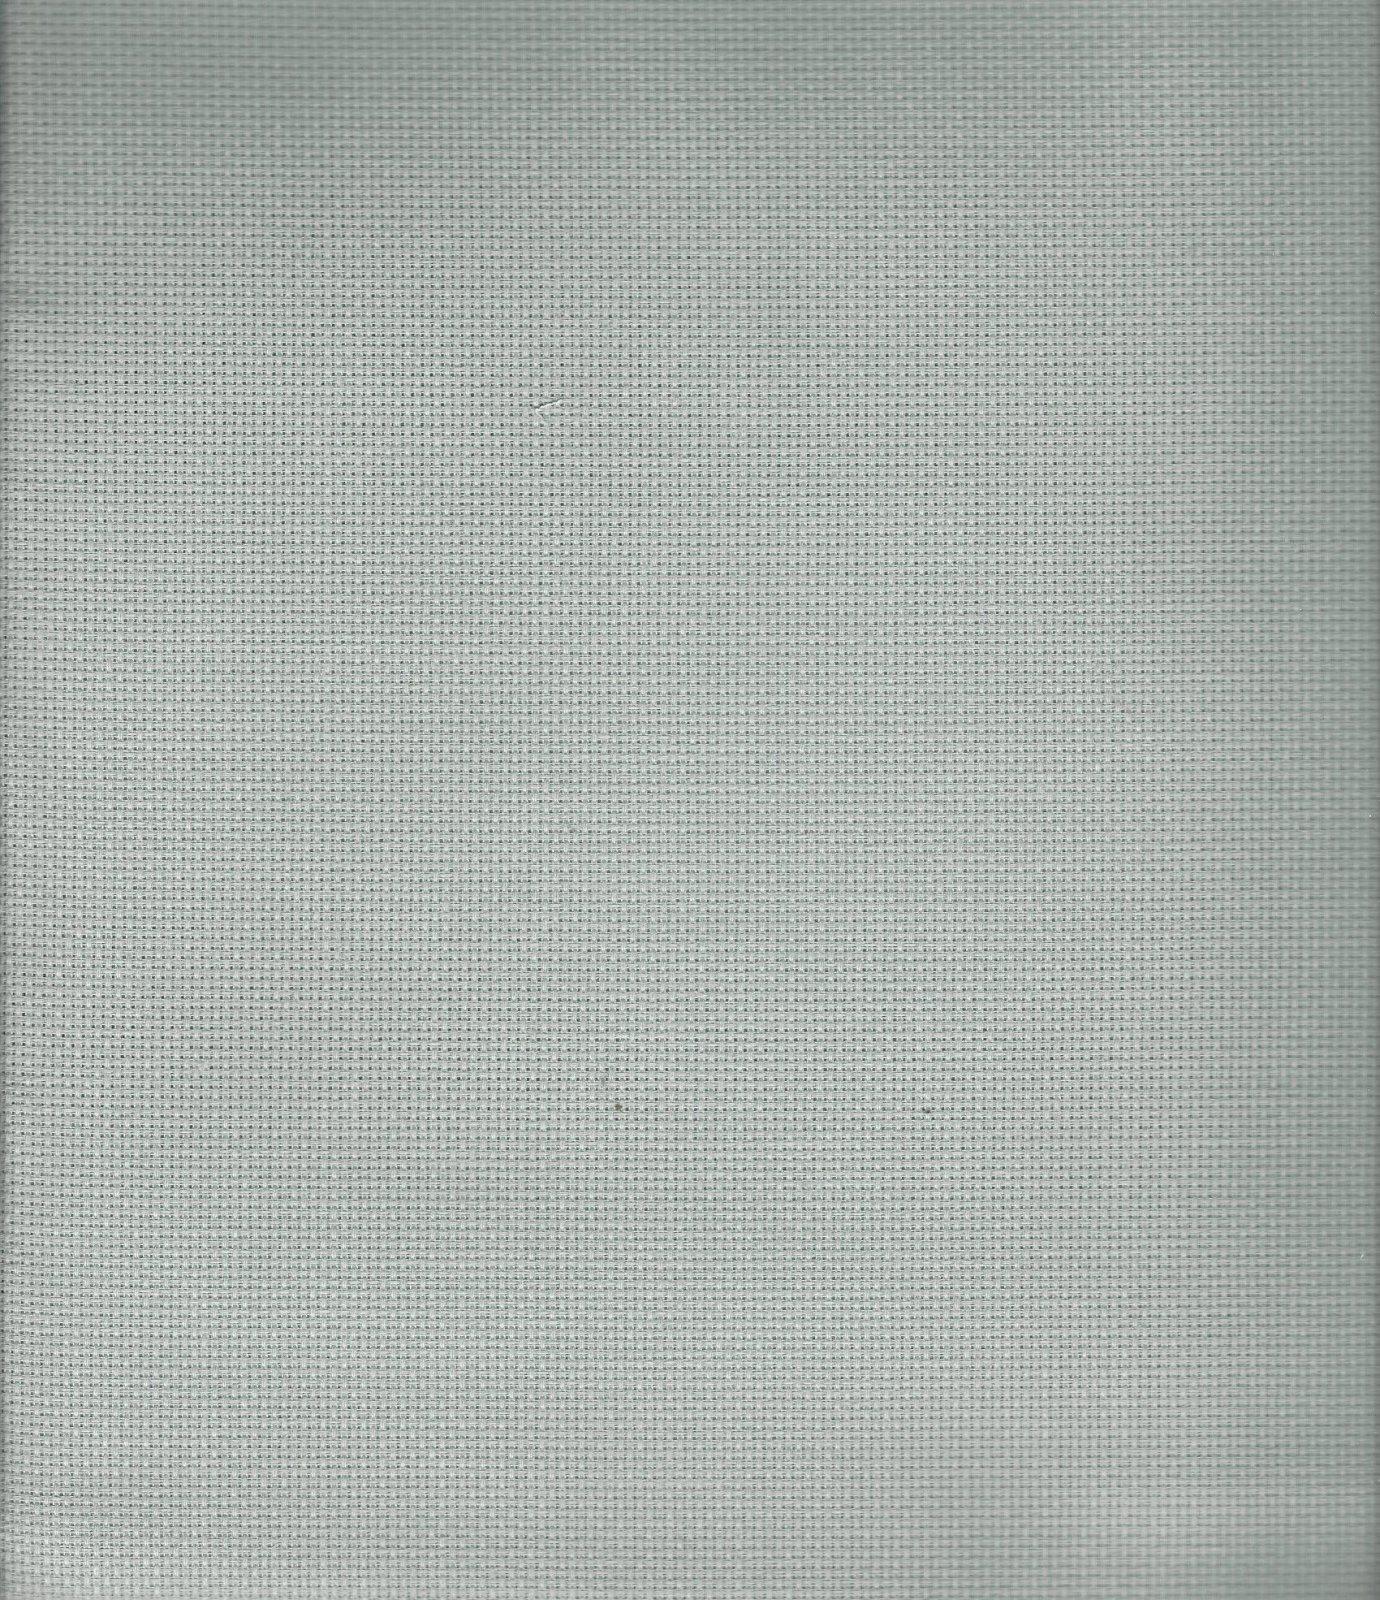 Aida 16ct Smokey Teal (discontinued color)